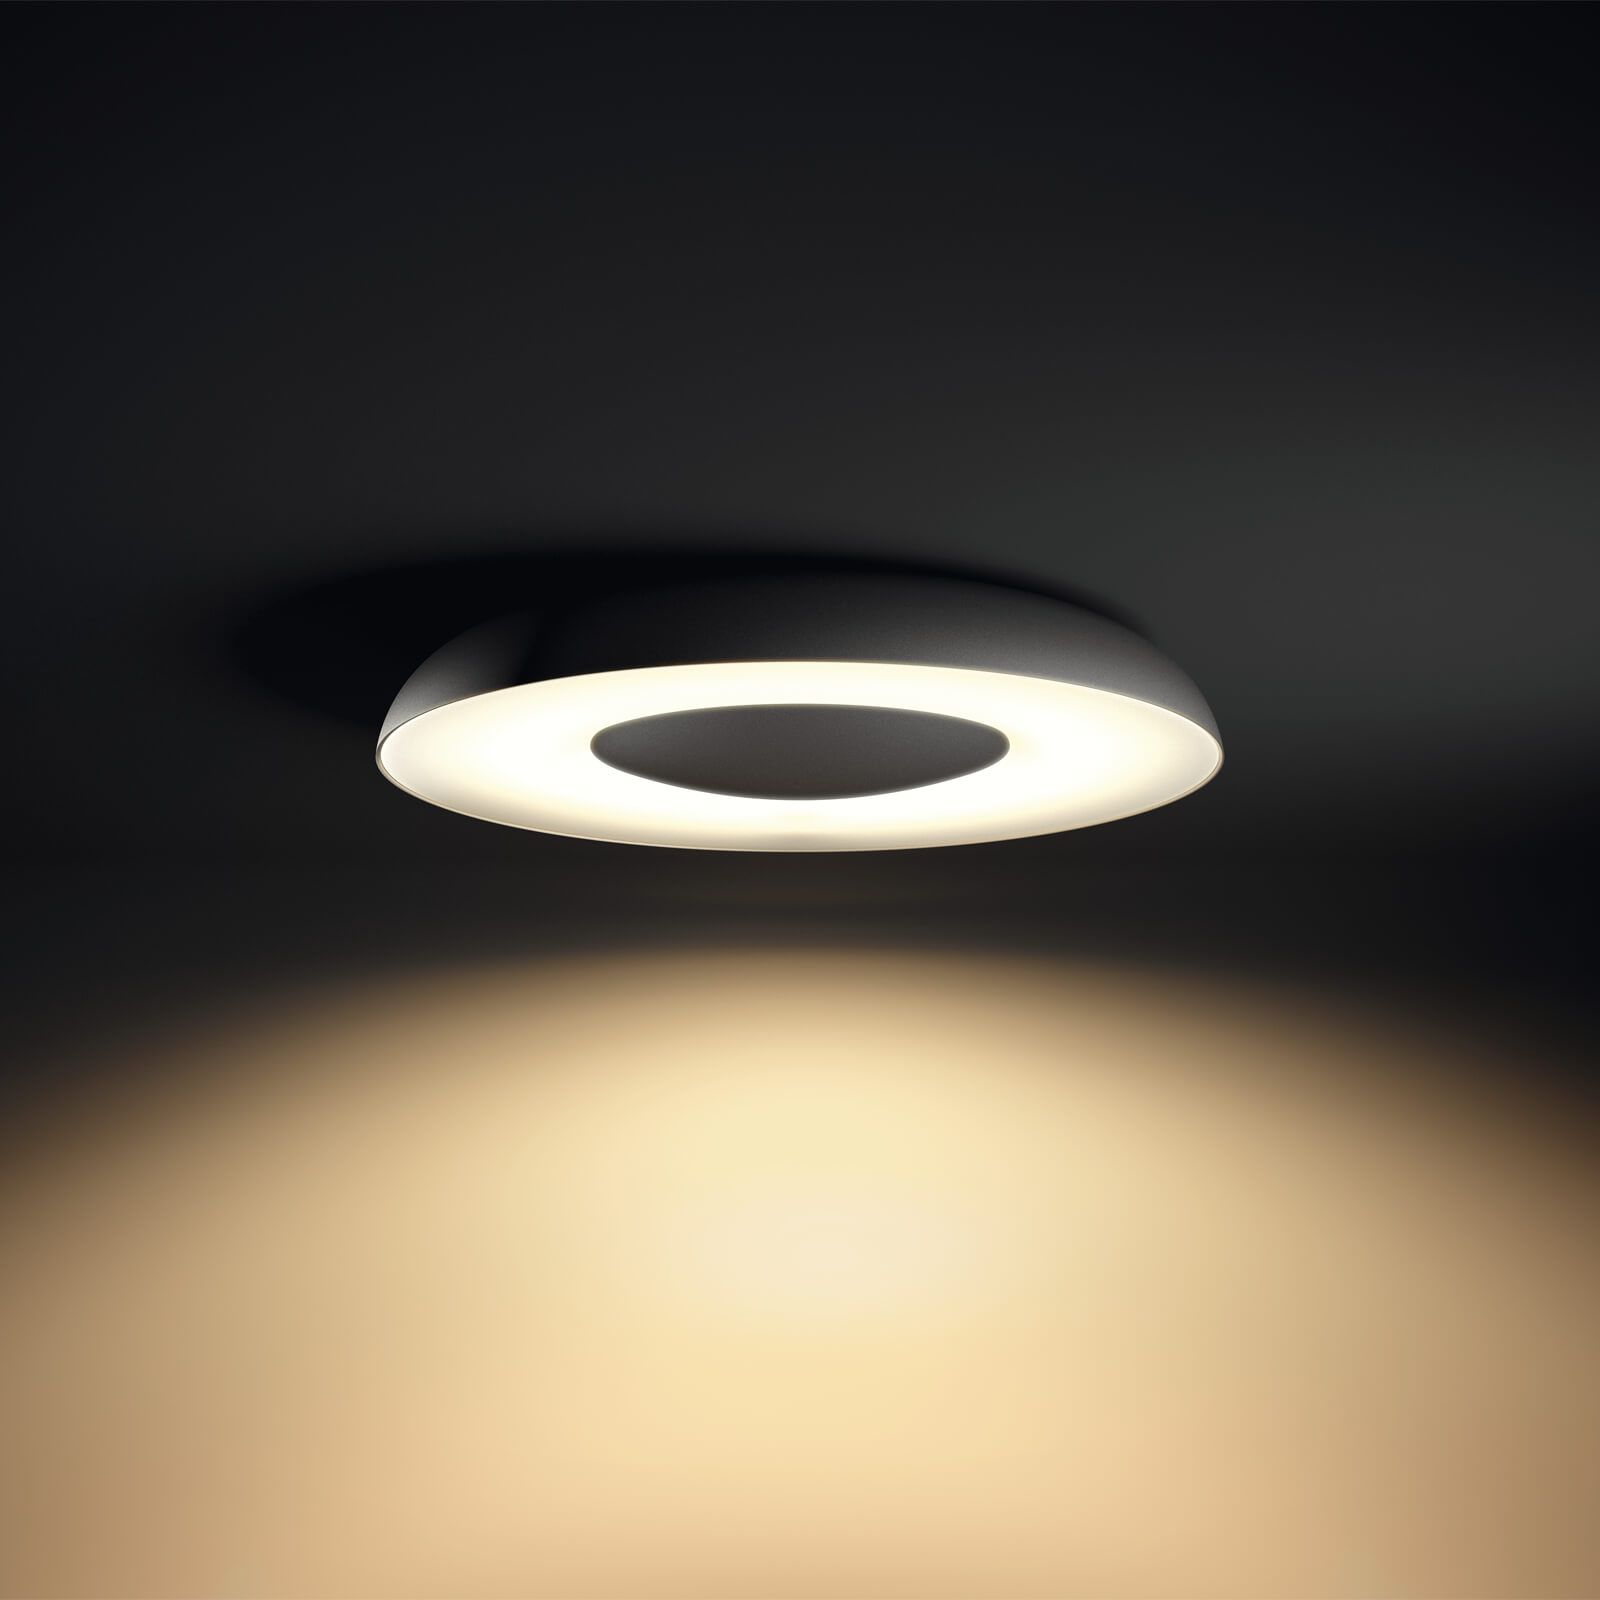 Philips Hue Still plafondlamp zwart (White Ambiance, incl DIM switch ...